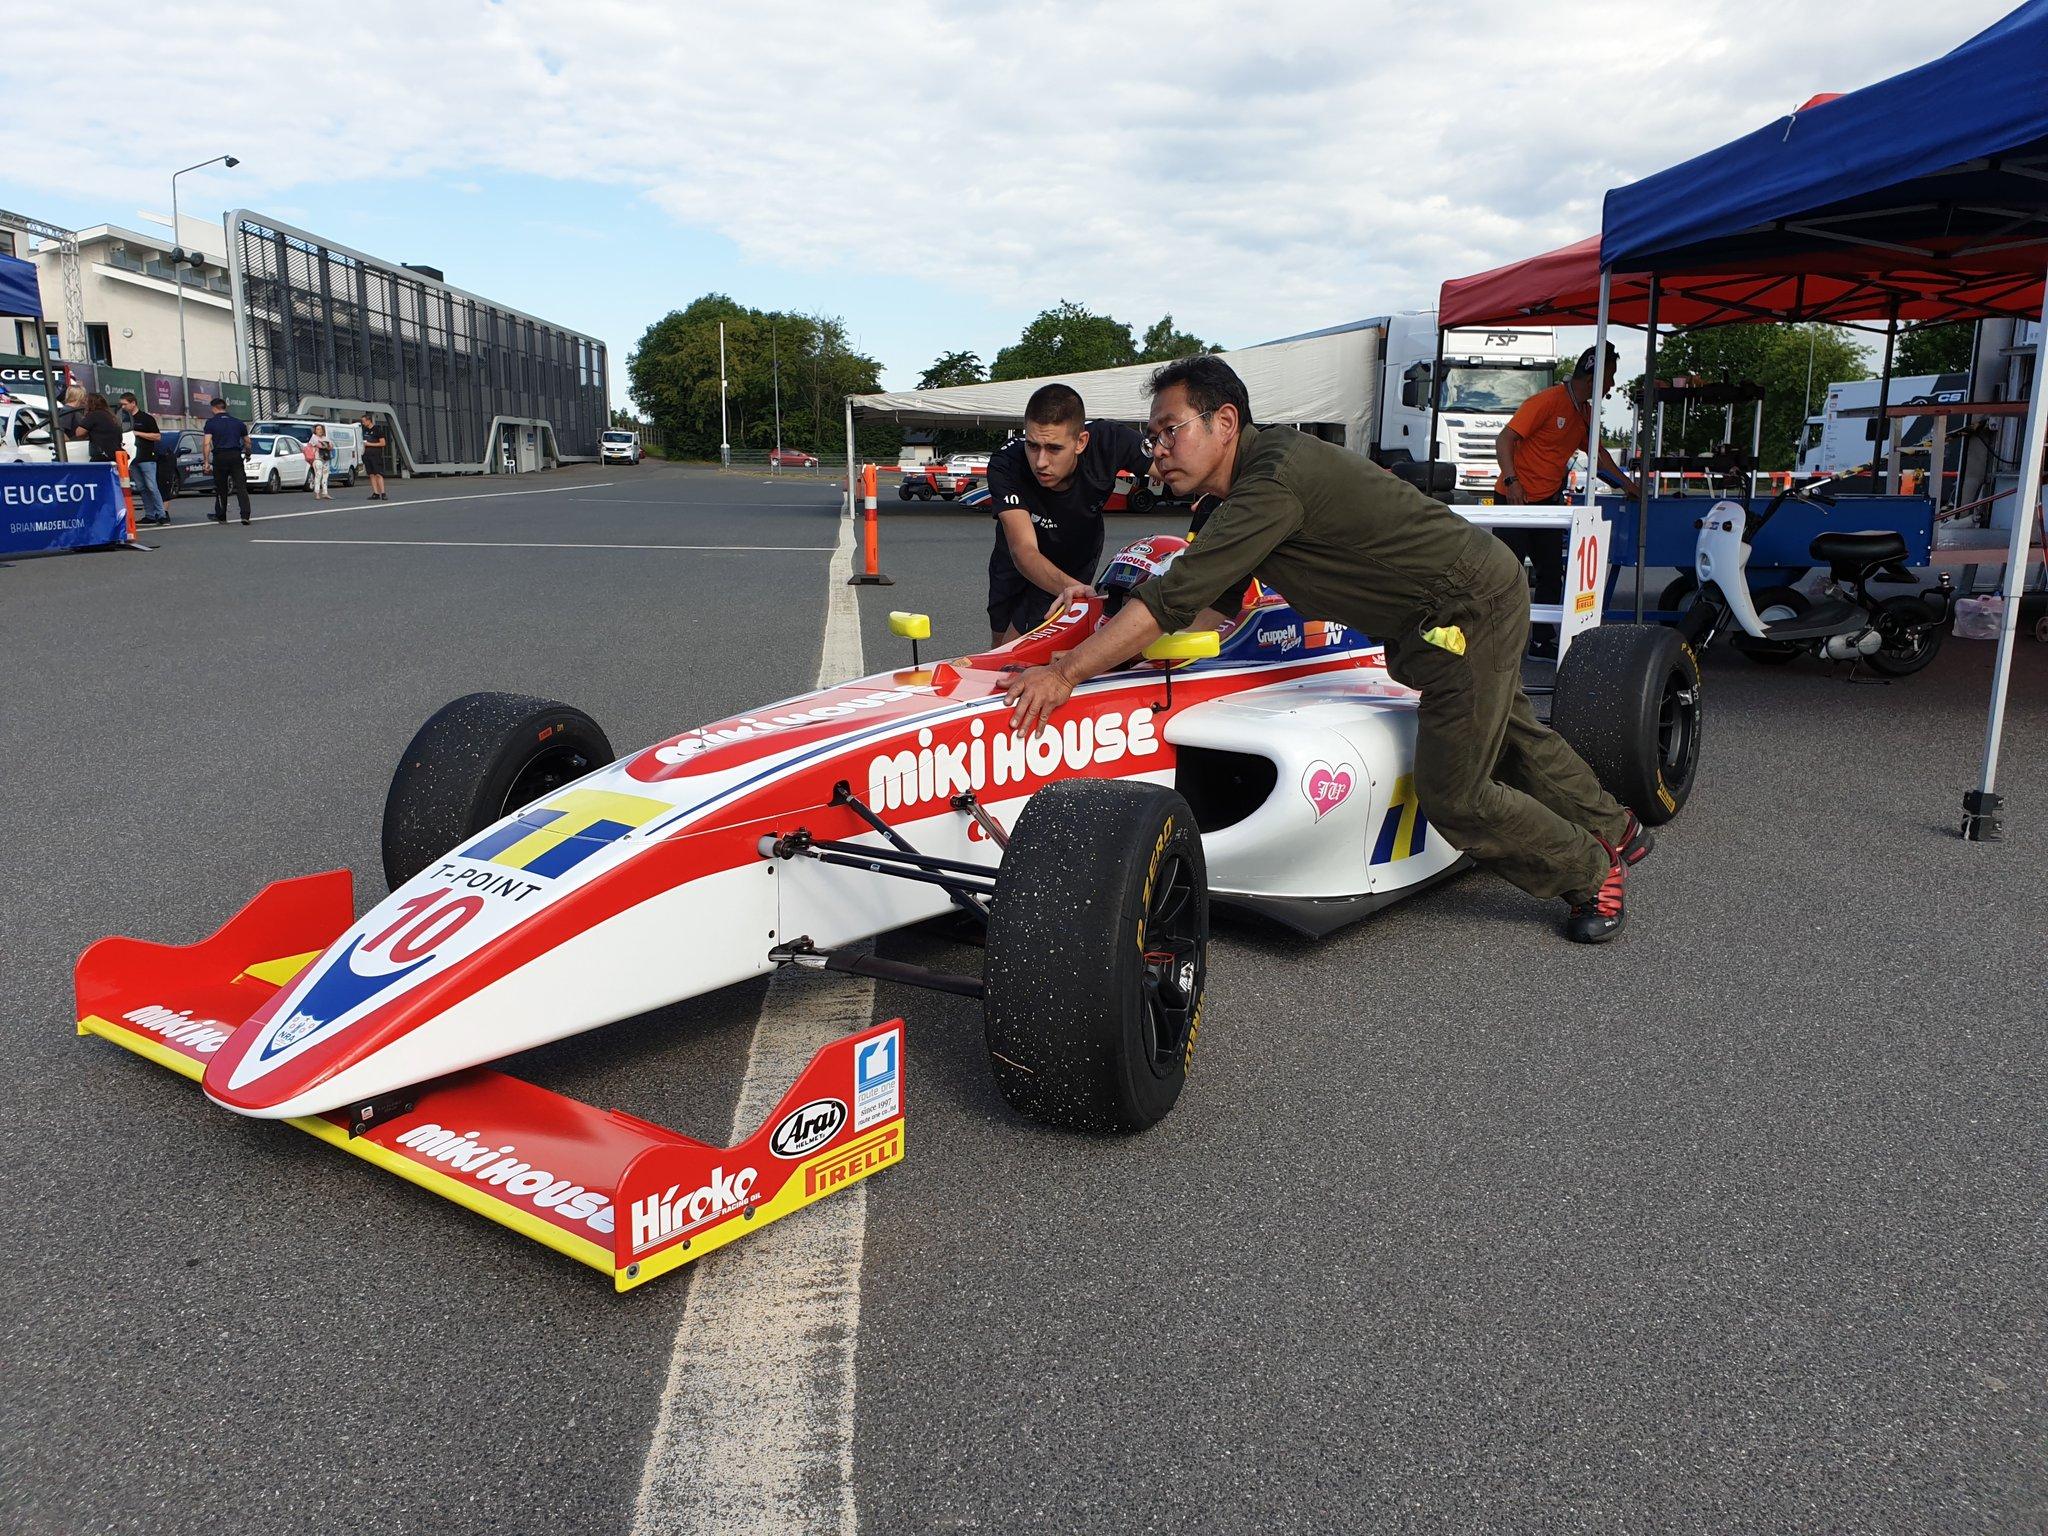 noda_racing